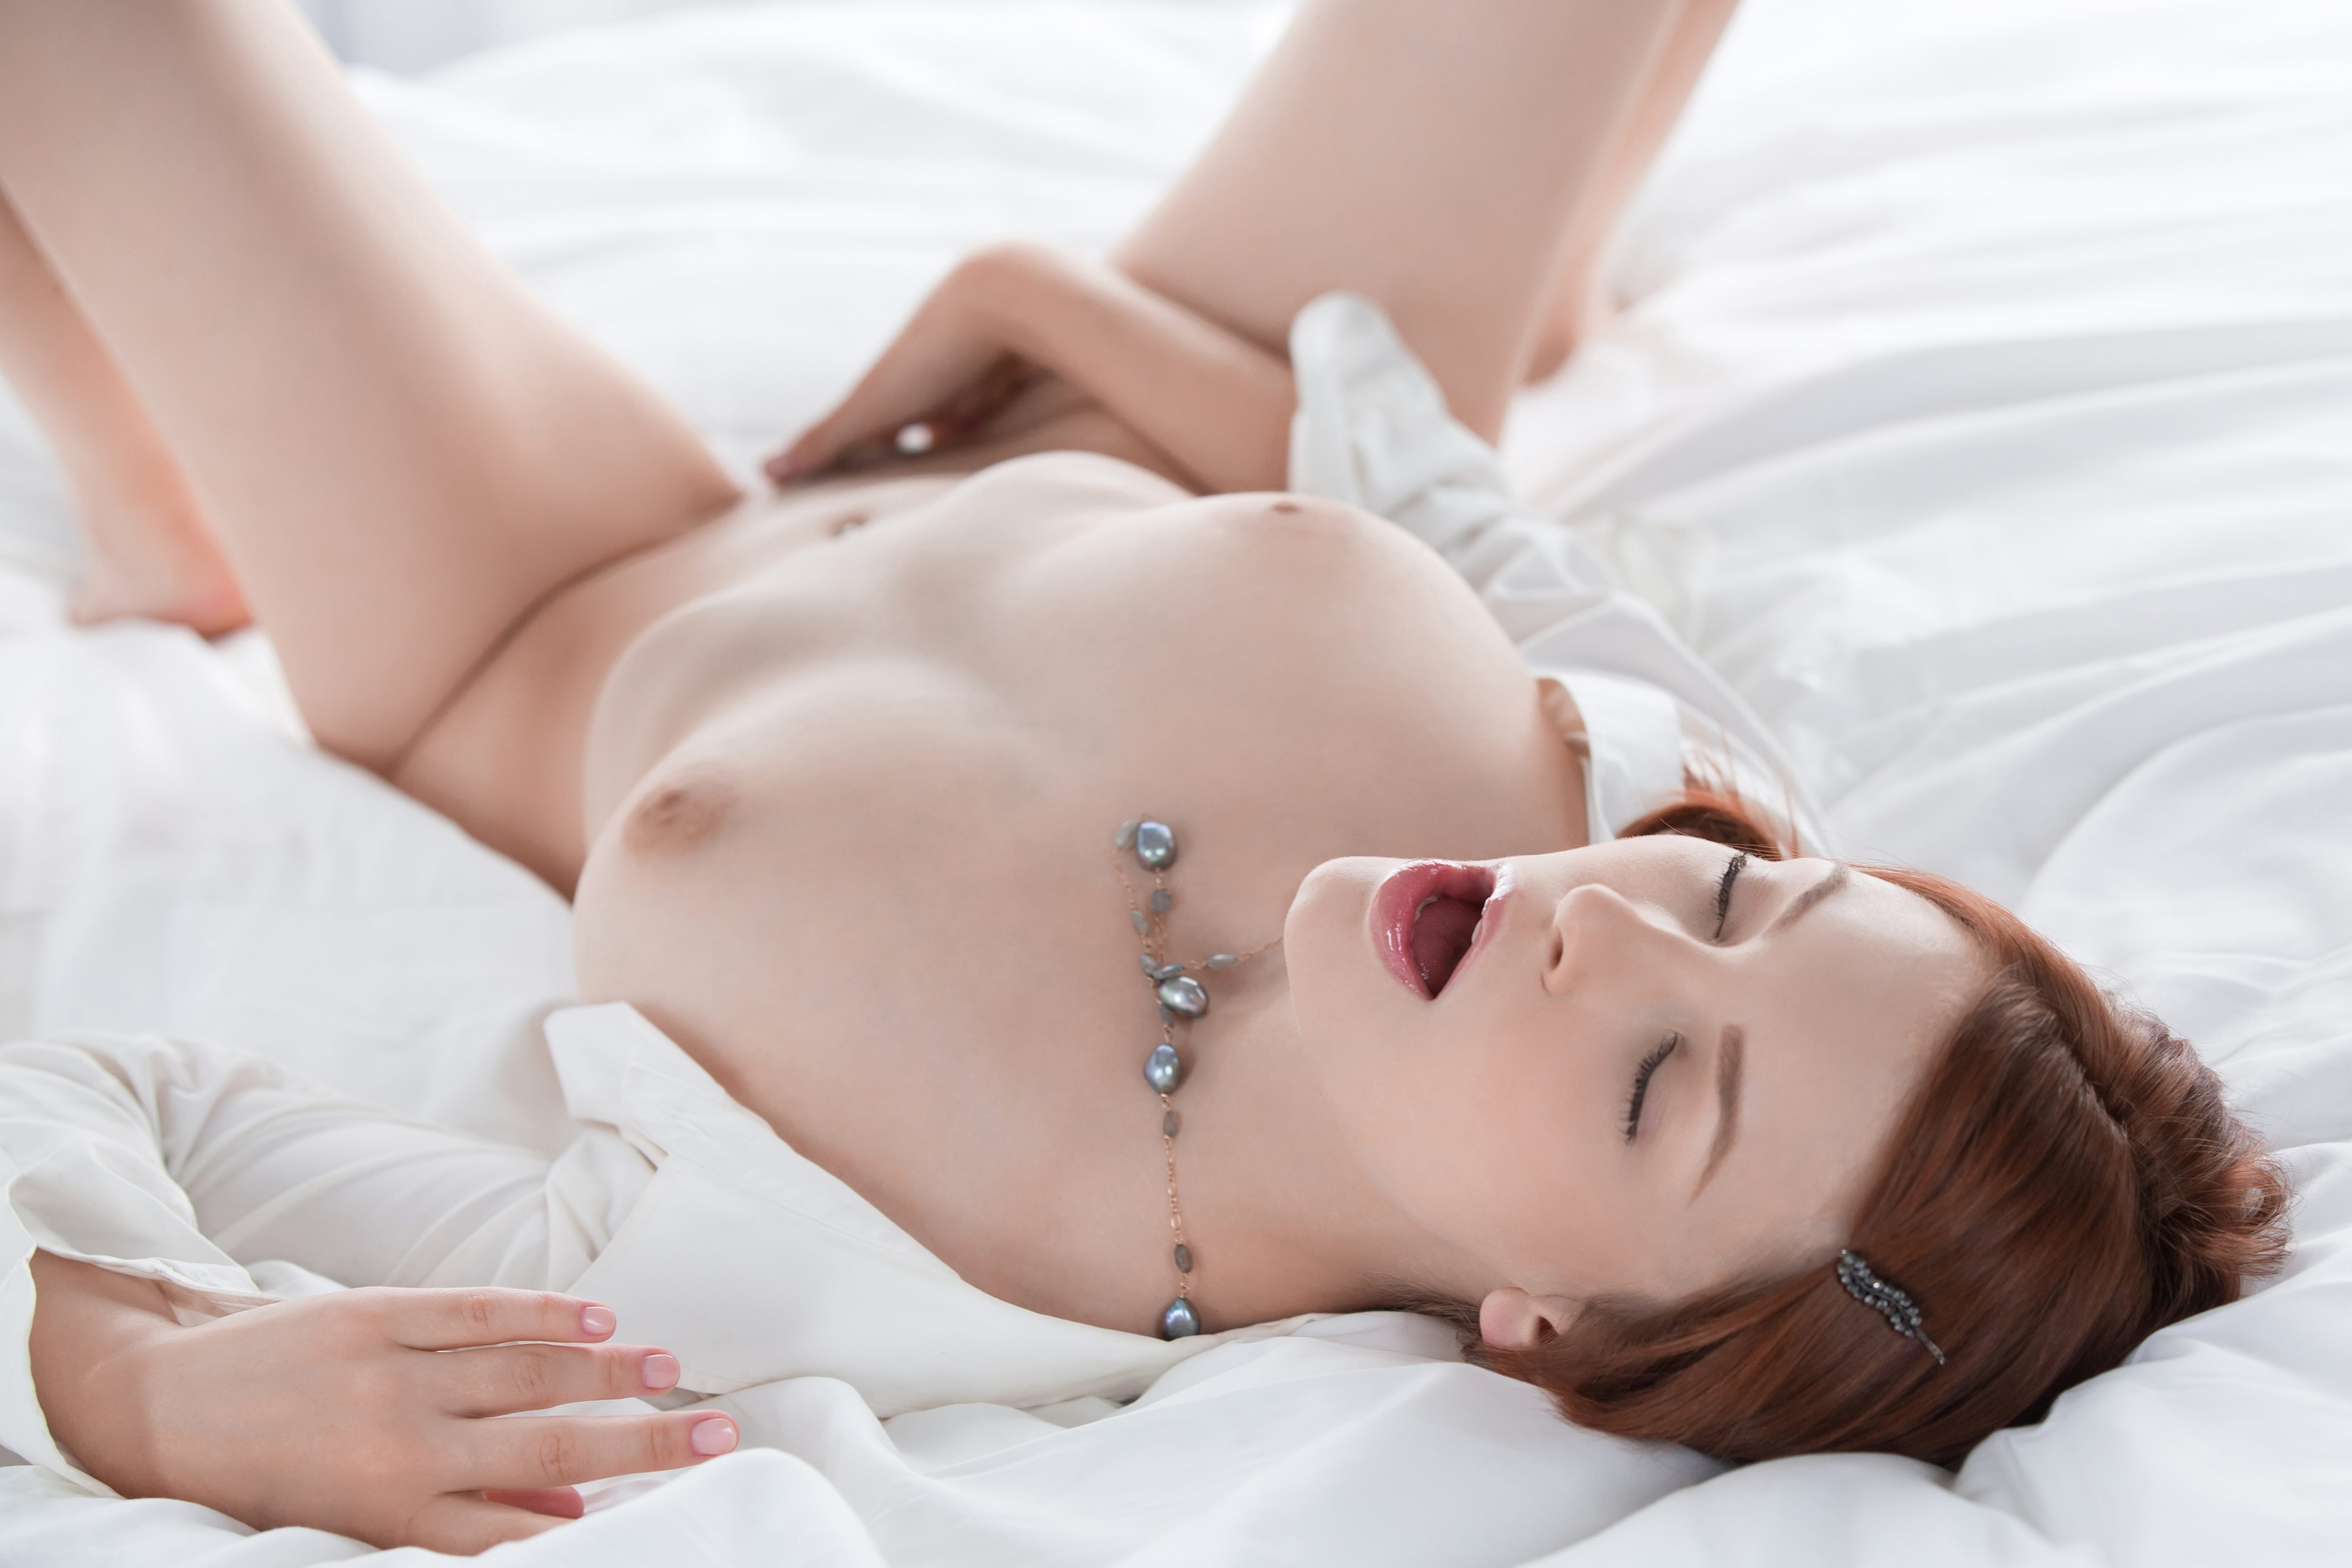 Asian moaning wmv